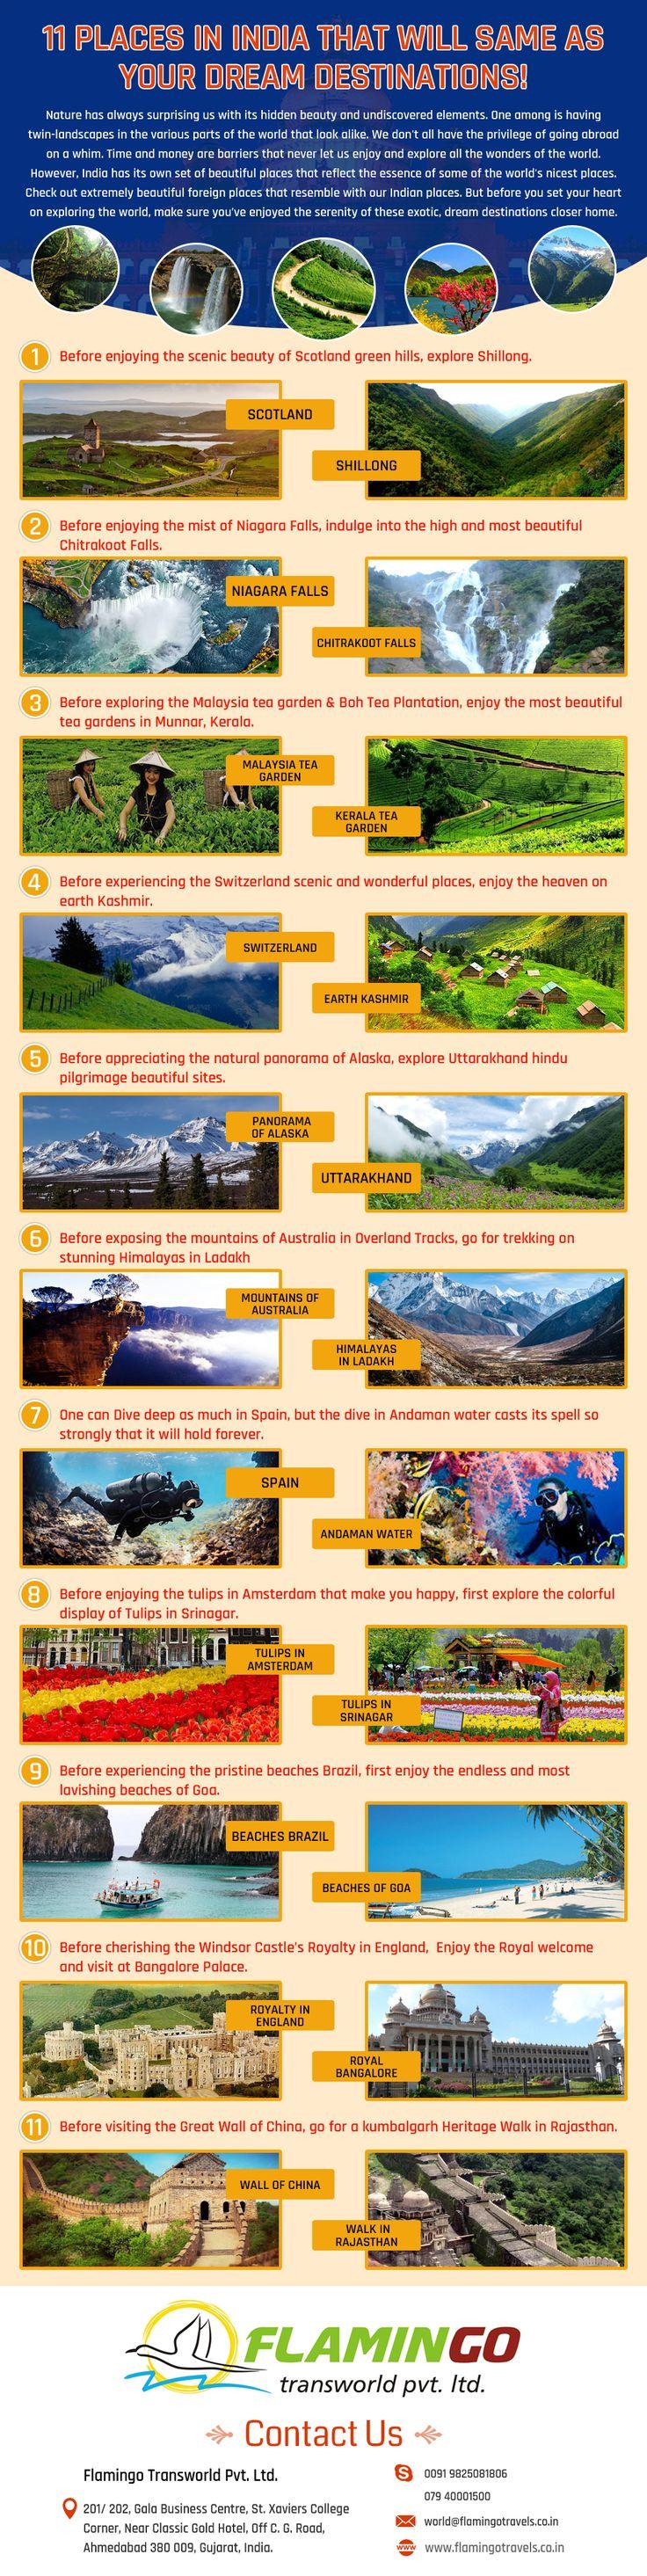 25 mejores im 225 genes de architecture vegetation en pinterest - 11 Places In India That Will Same As Your Dream Destinations